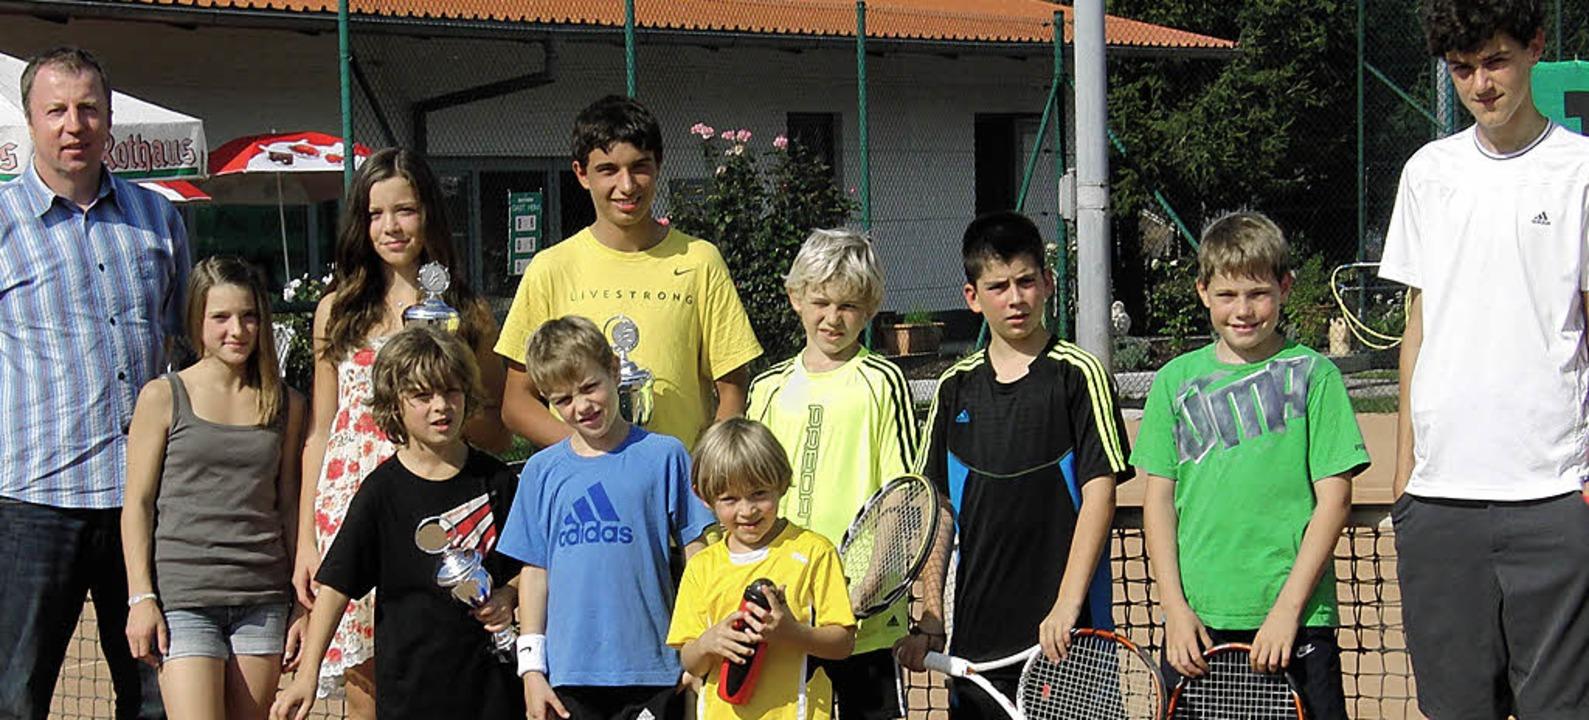 Jugend ermittelt Meister - Endingen - Badische Zeitung